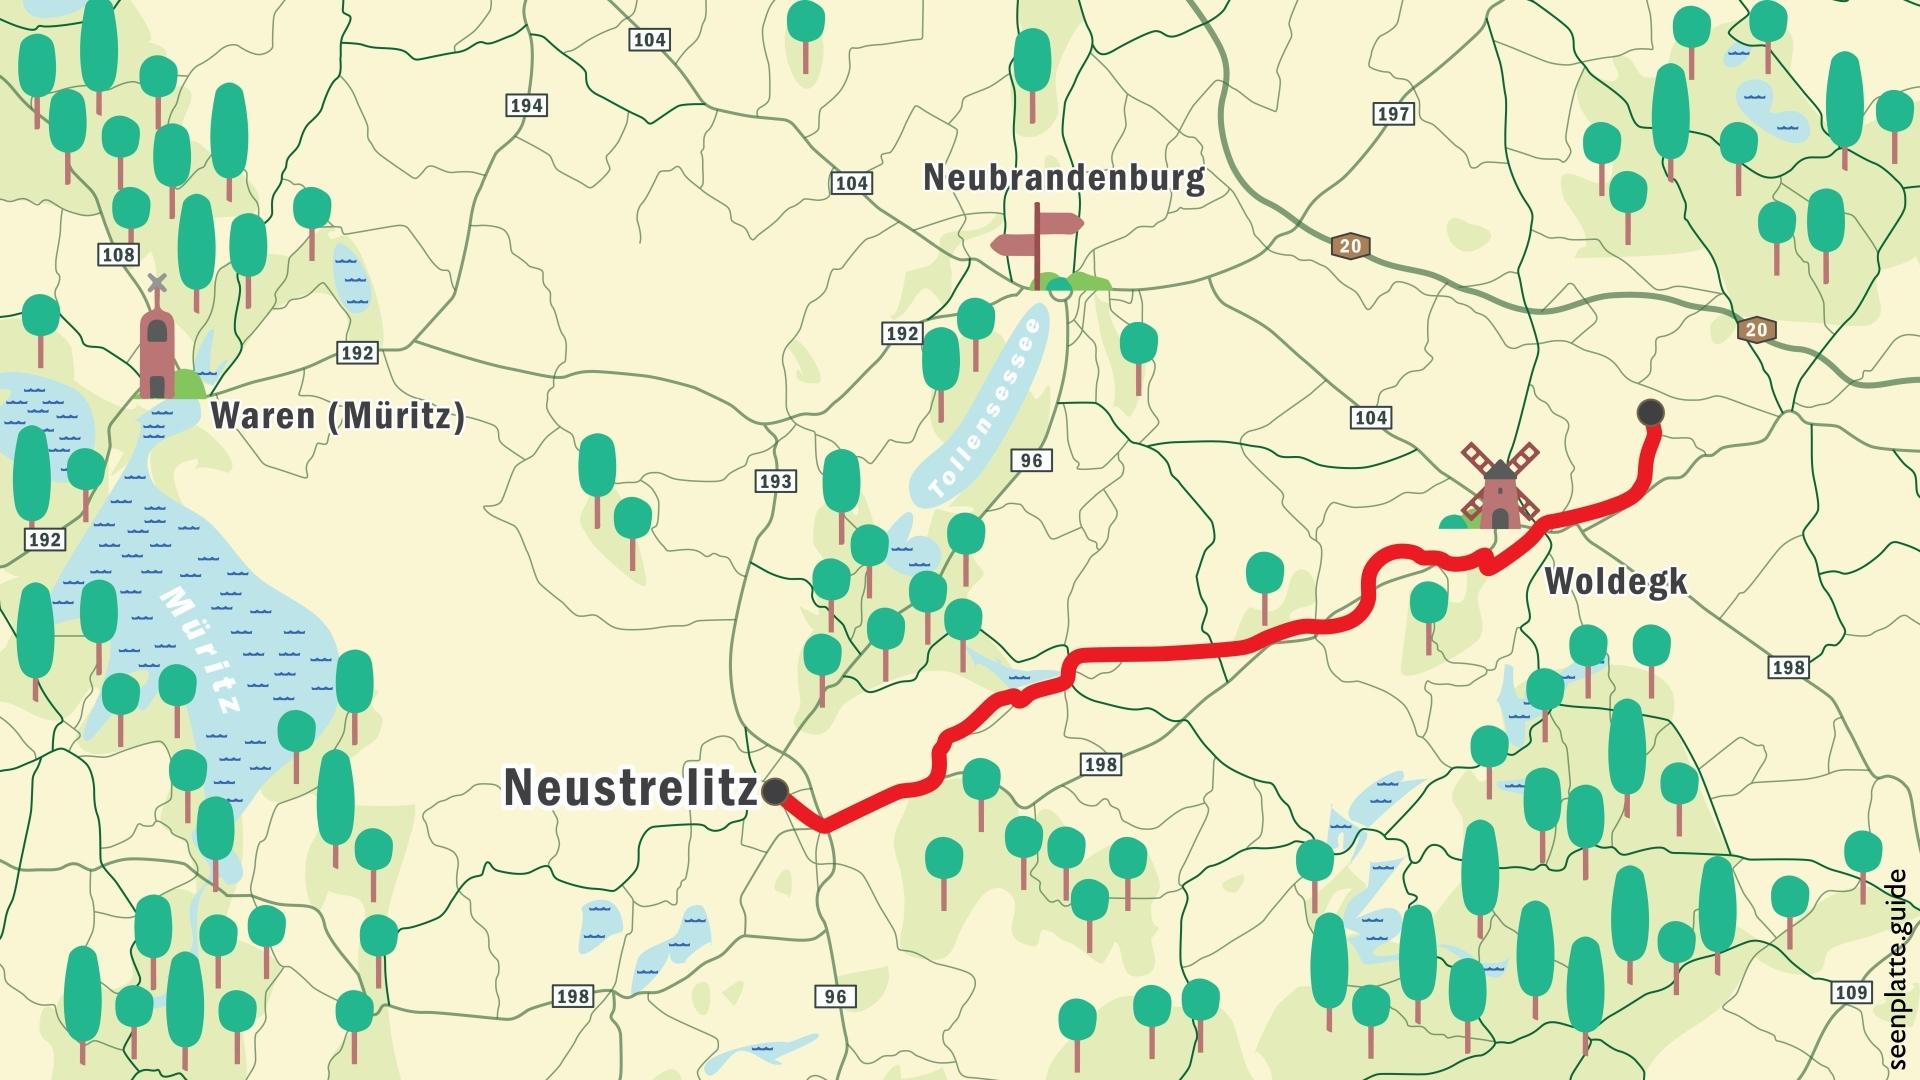 Eisenbahnweg in Mecklenburg-Vorpommern